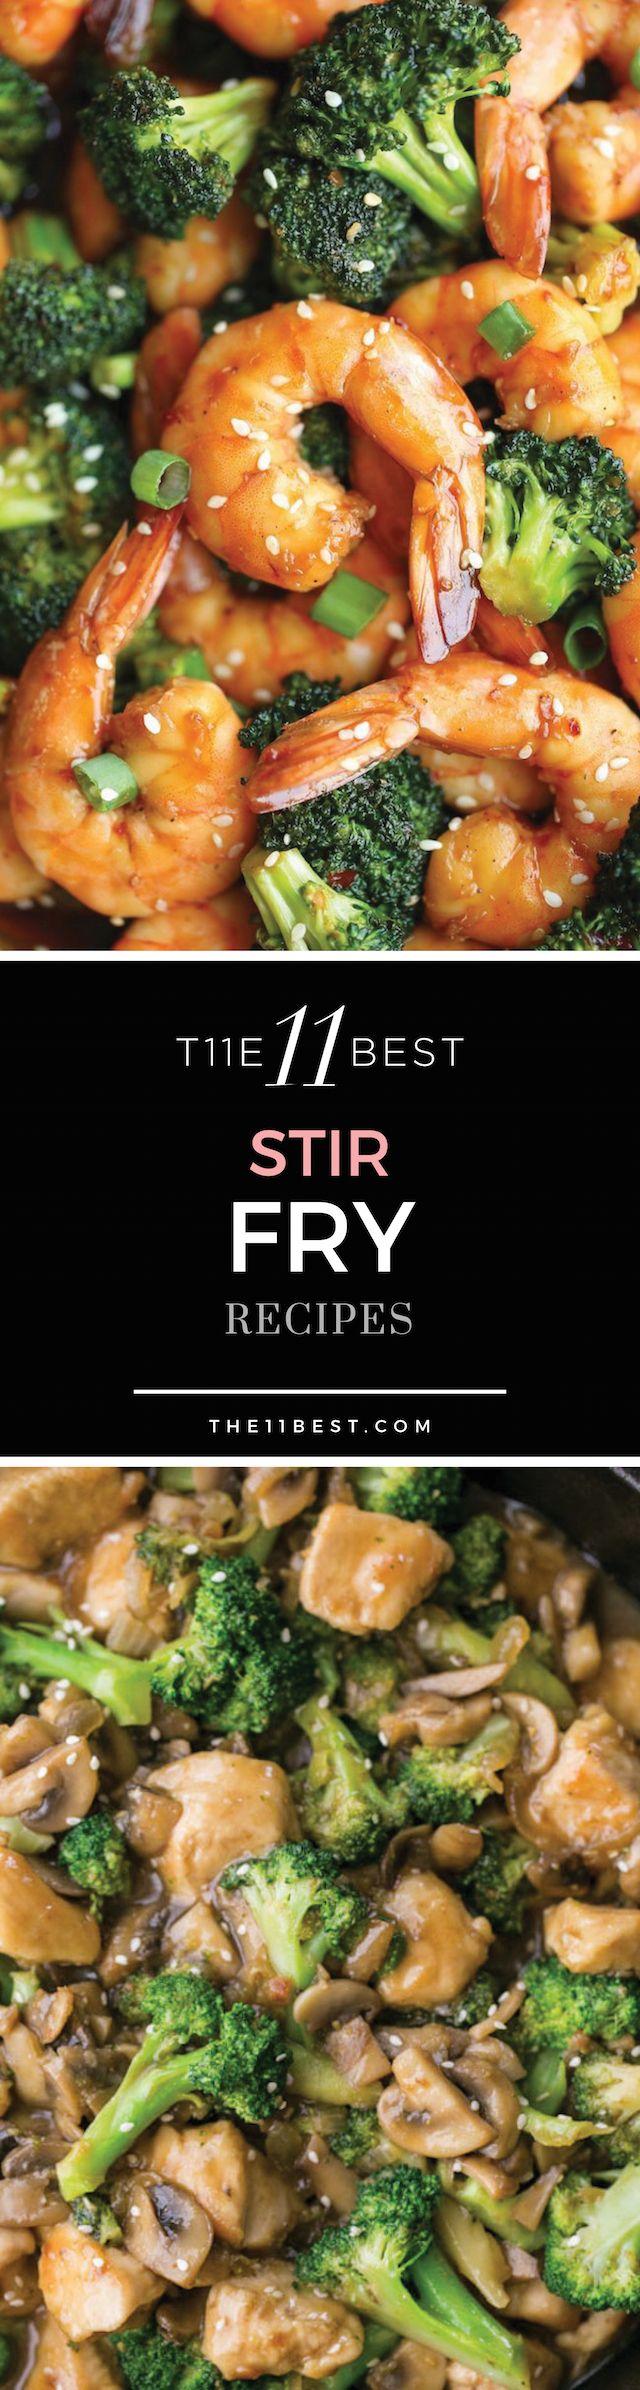 The 11 Best Stir Fry Recipes